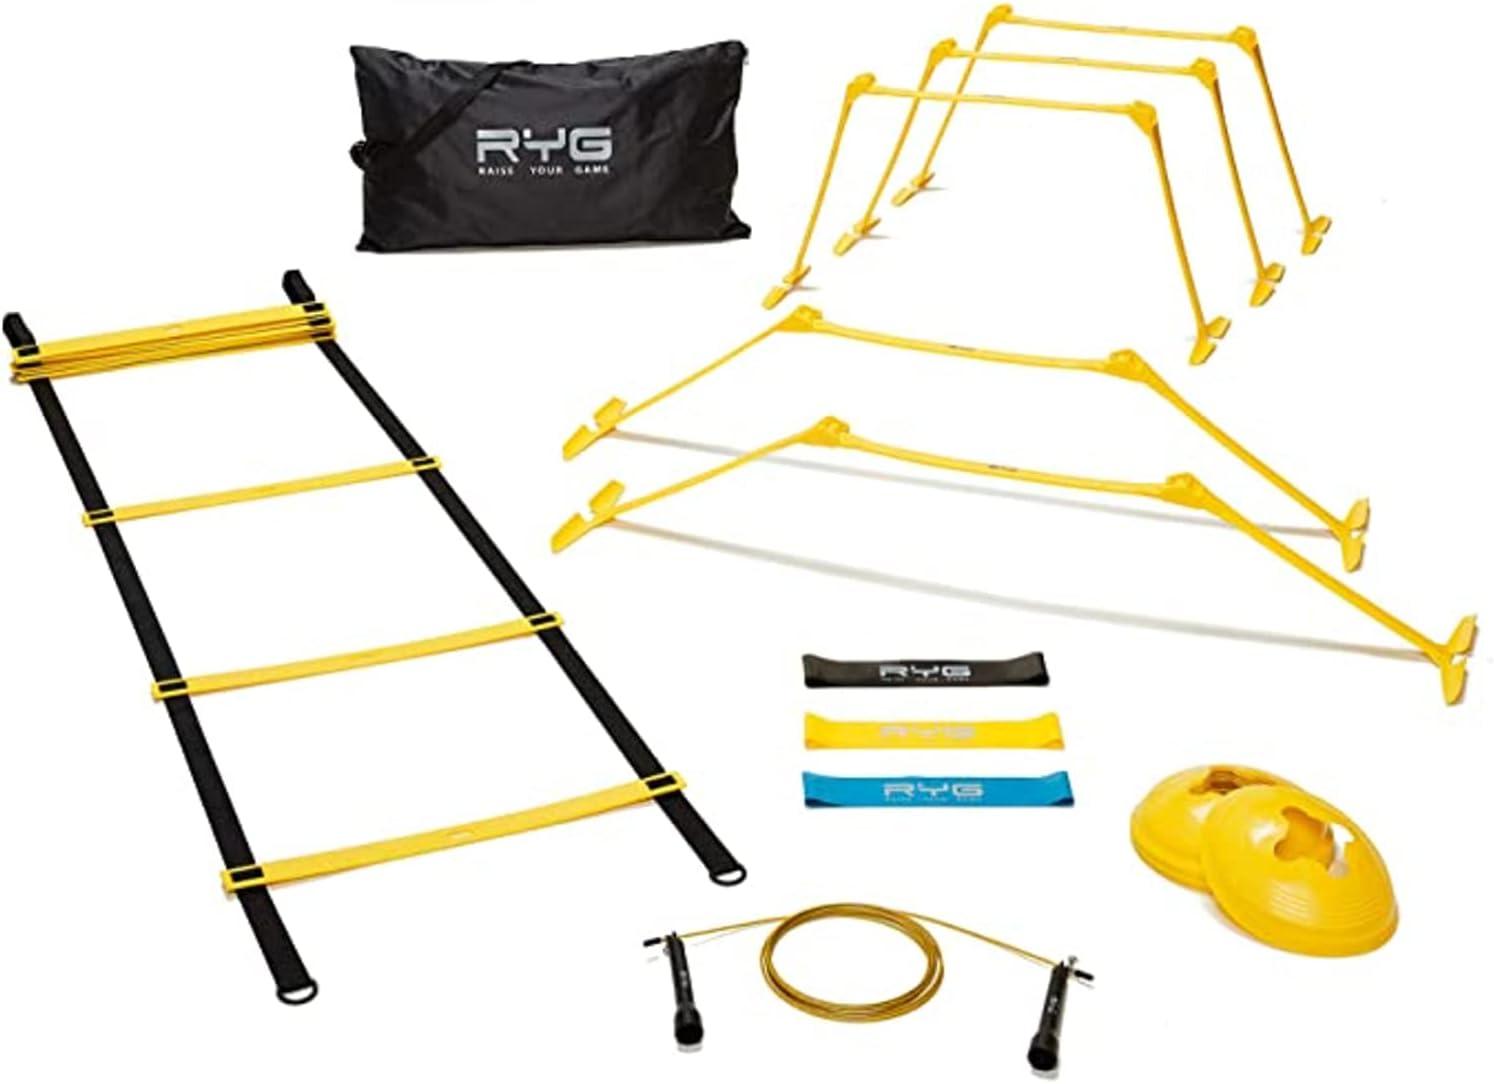 Raise Tulsa Mall Your Game Agility Ladder Speed RYG Colorado Springs Mall Set- 8 Cones Training